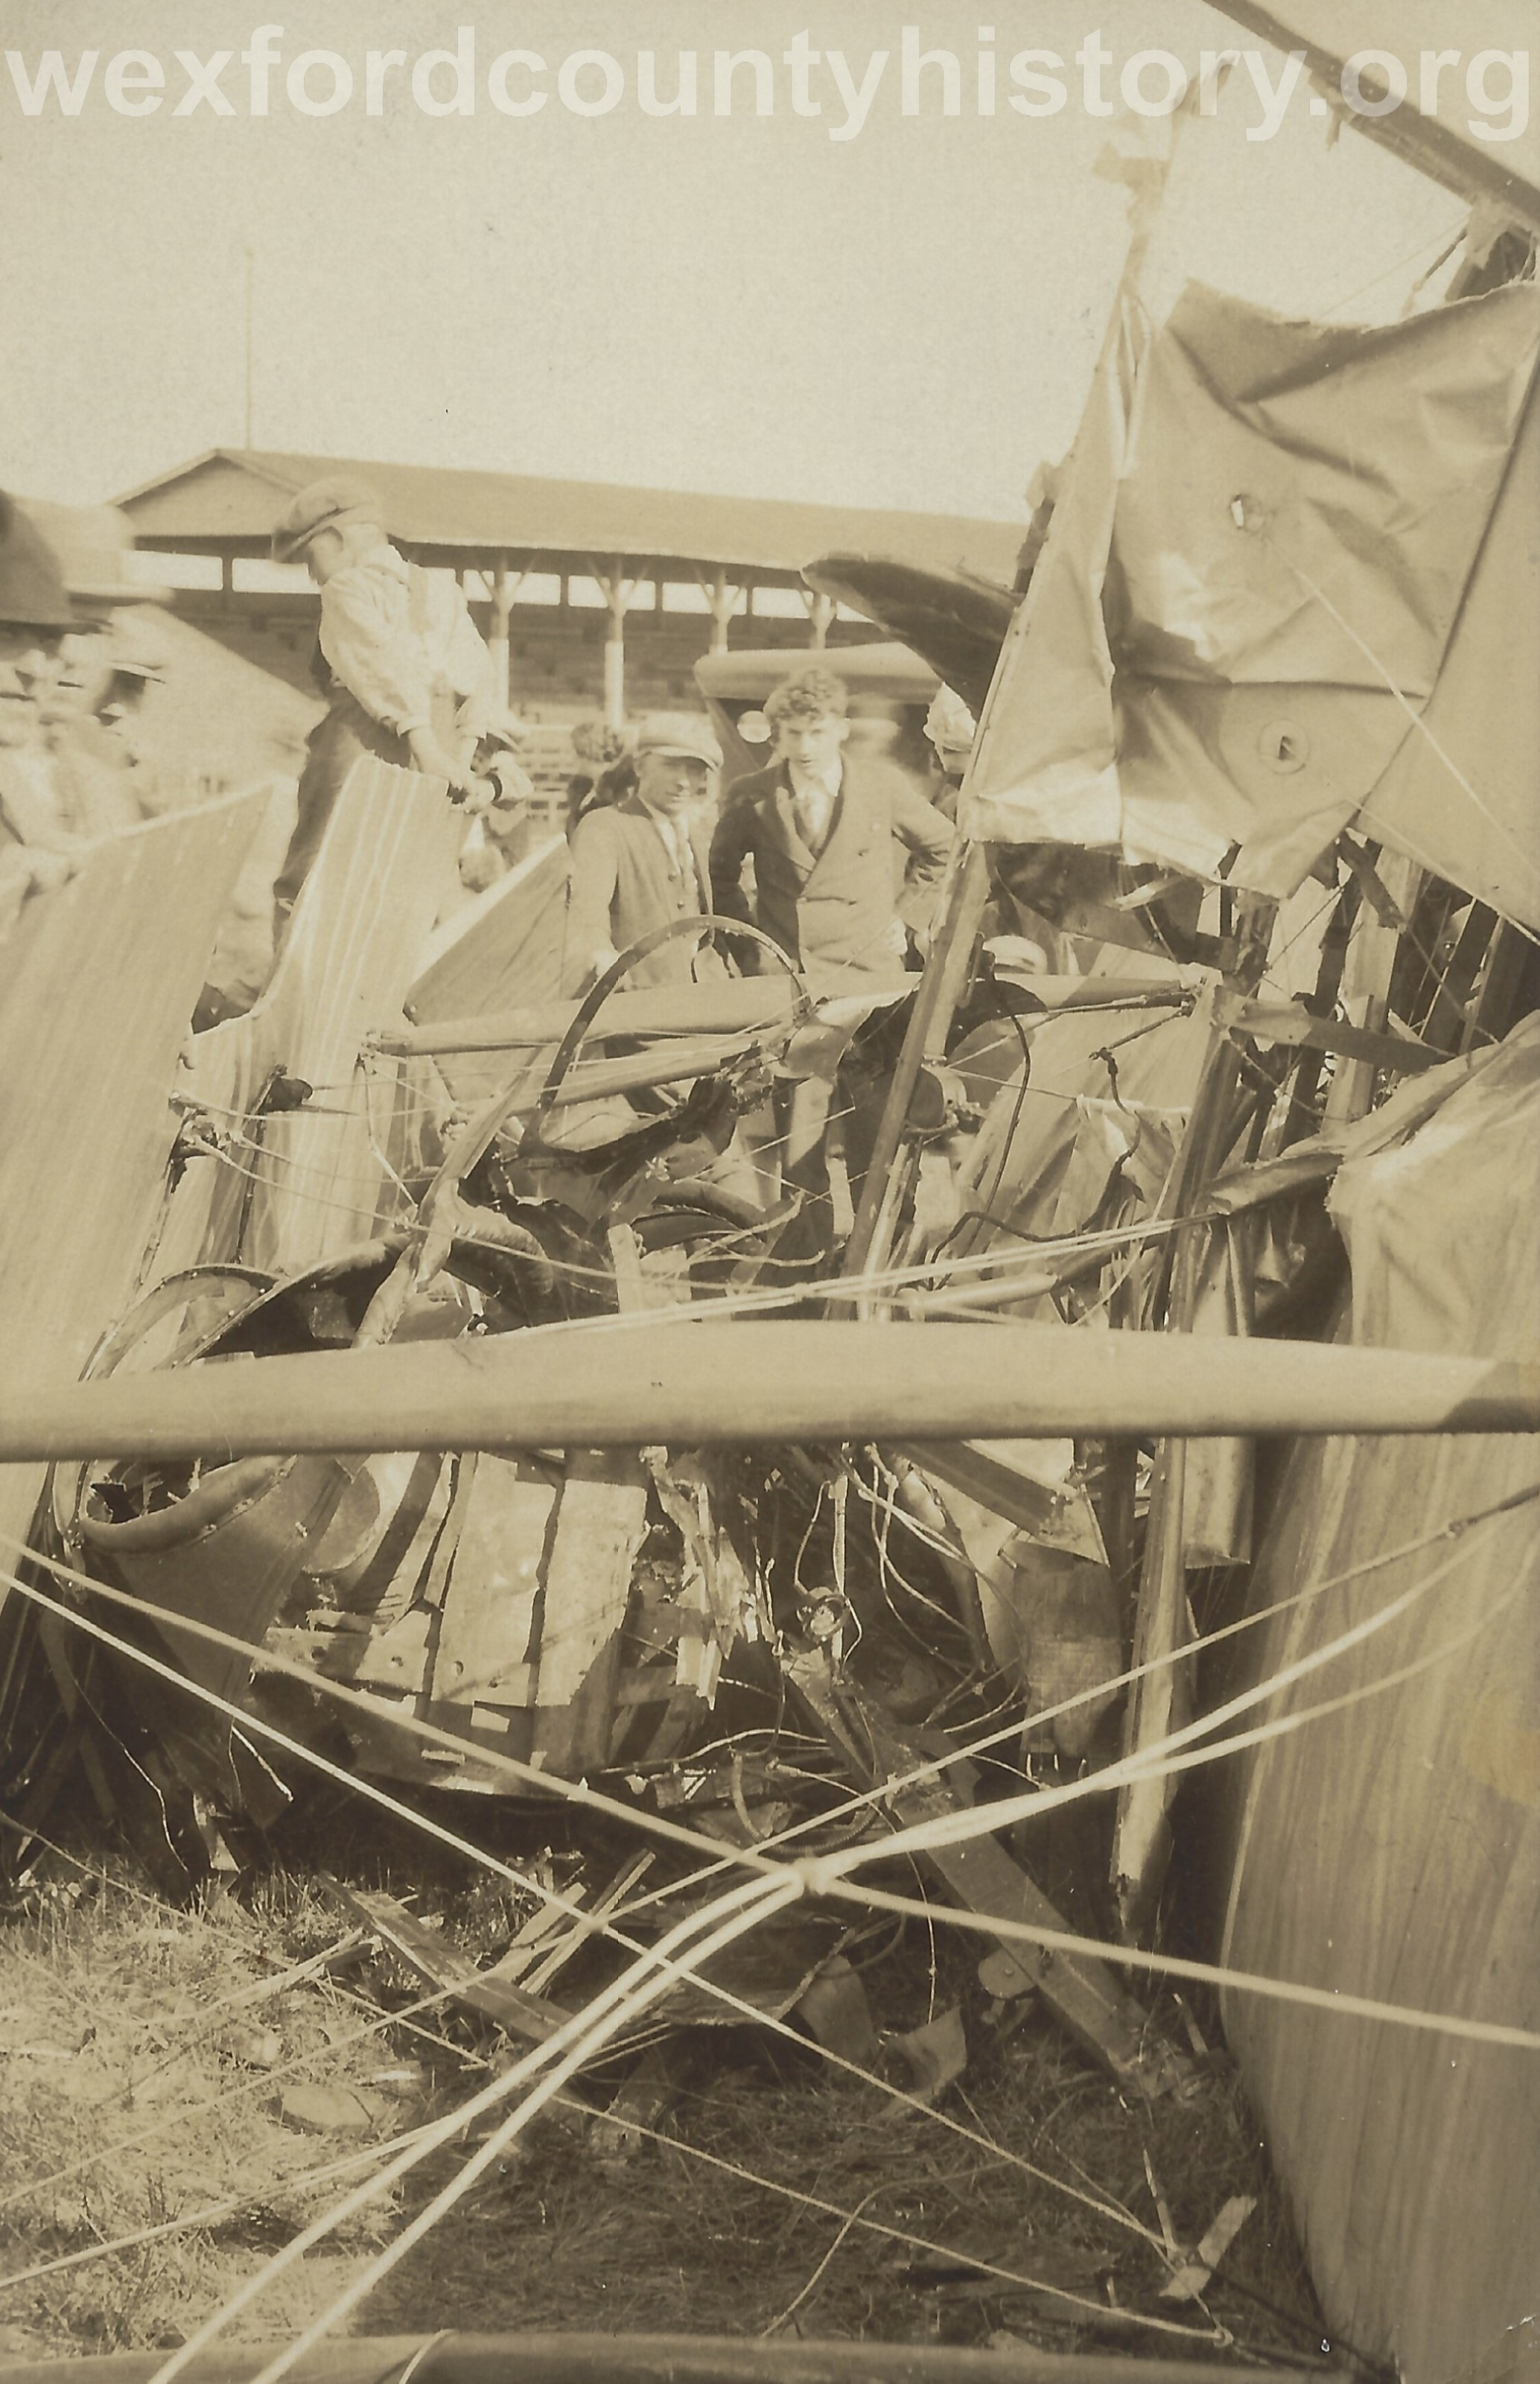 Cadillac-Misc-Airplane-Crash-At-The-Fairgrounds-2